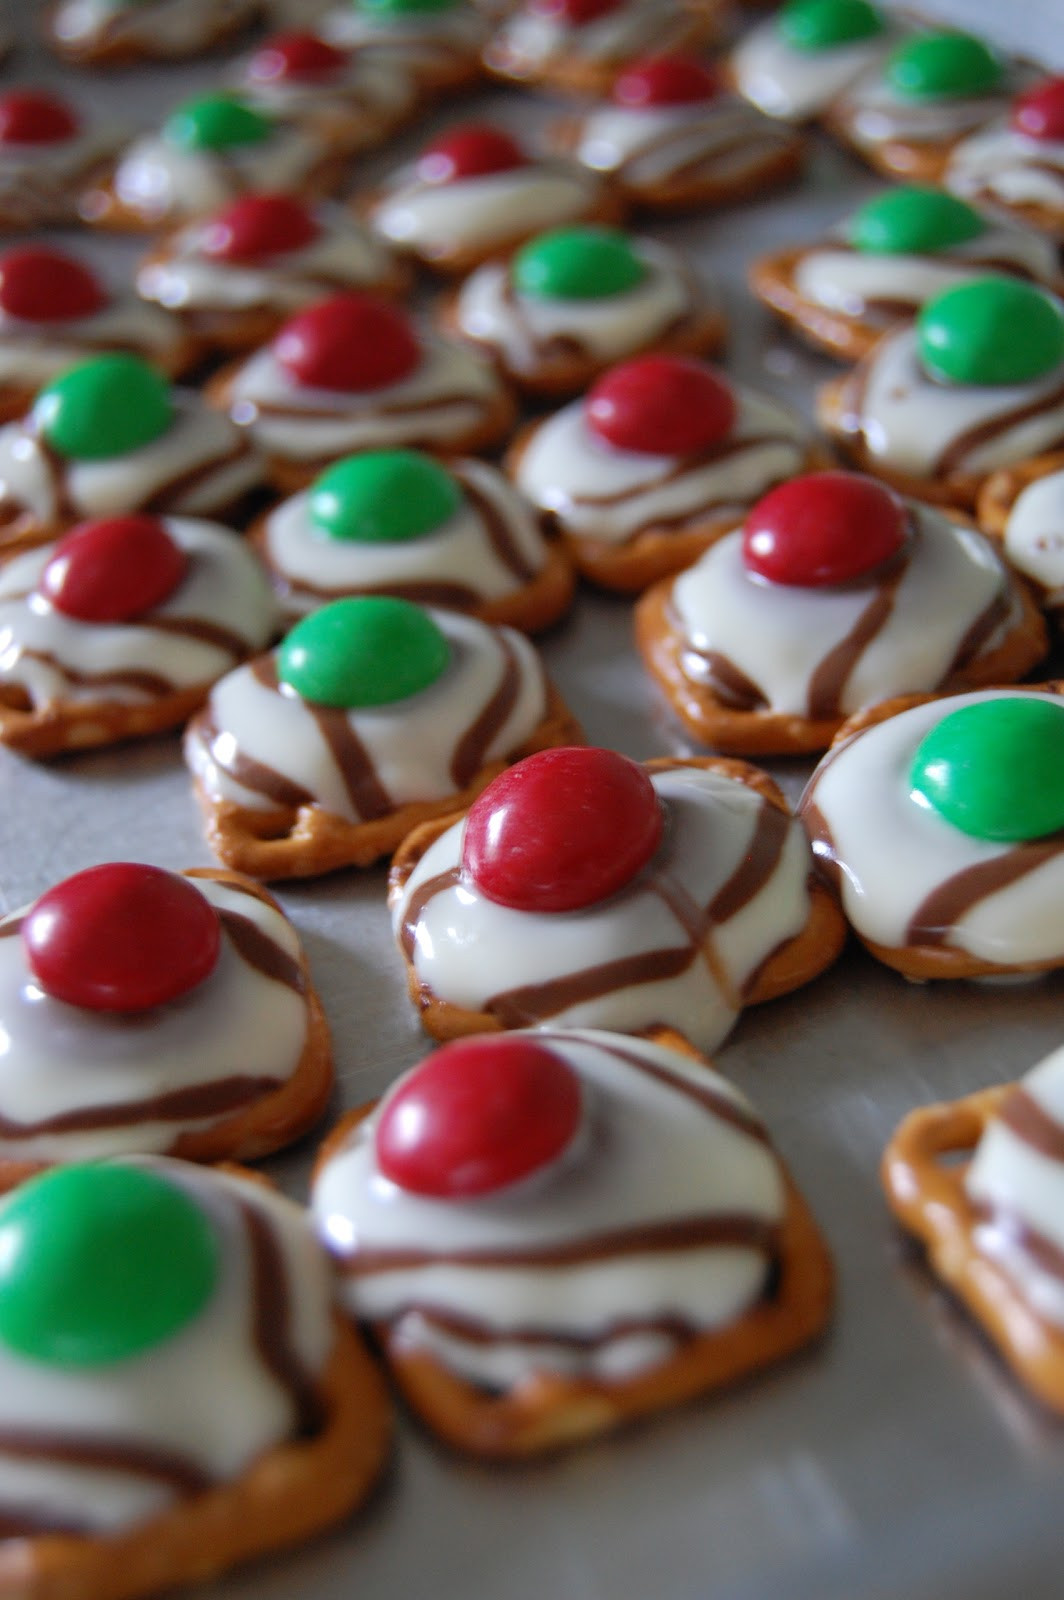 Baking For Christmas  Little Toewsies Easy Christmas Baking 101